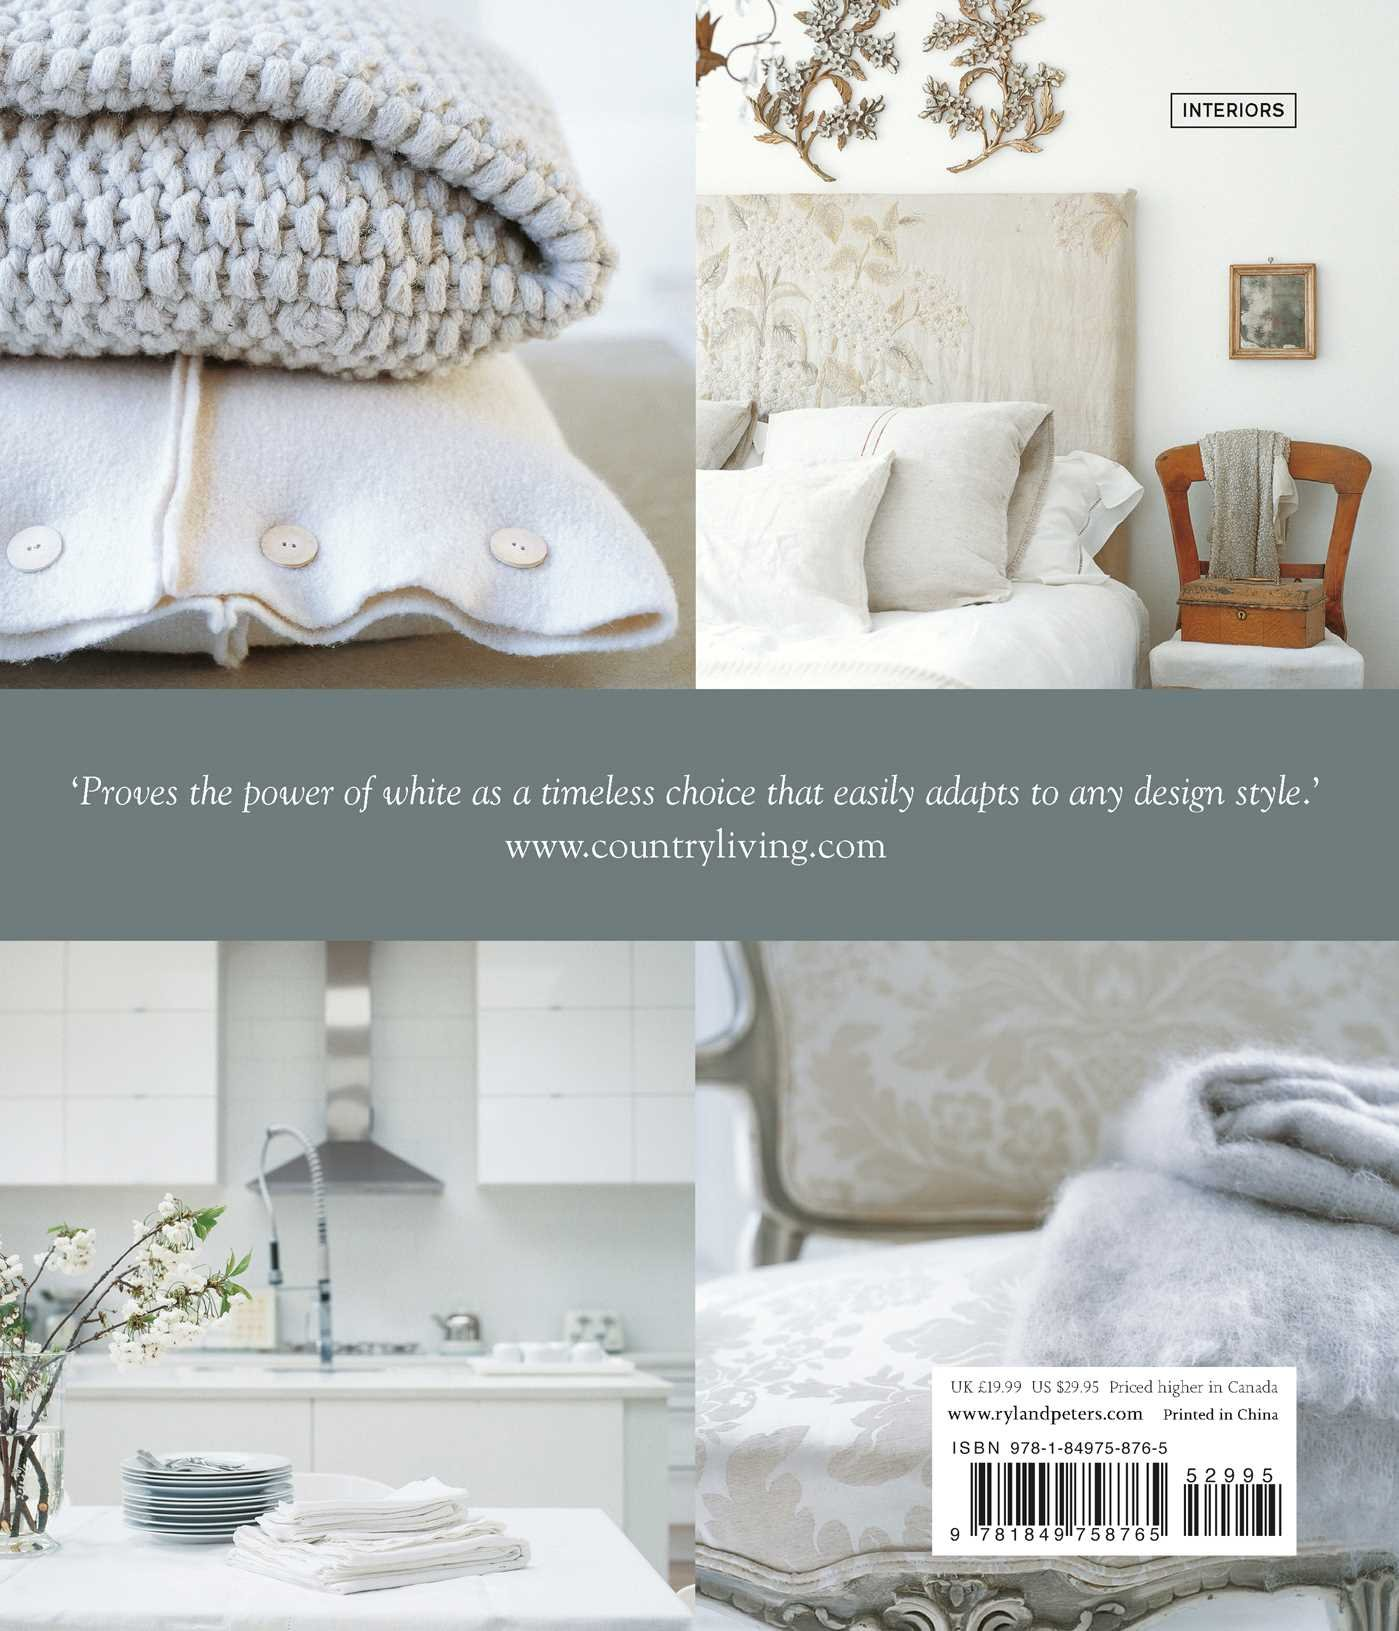 Amazon.com: At Home With White (9781849758765): Atlanta Bartlett, Karena  Callen: Books